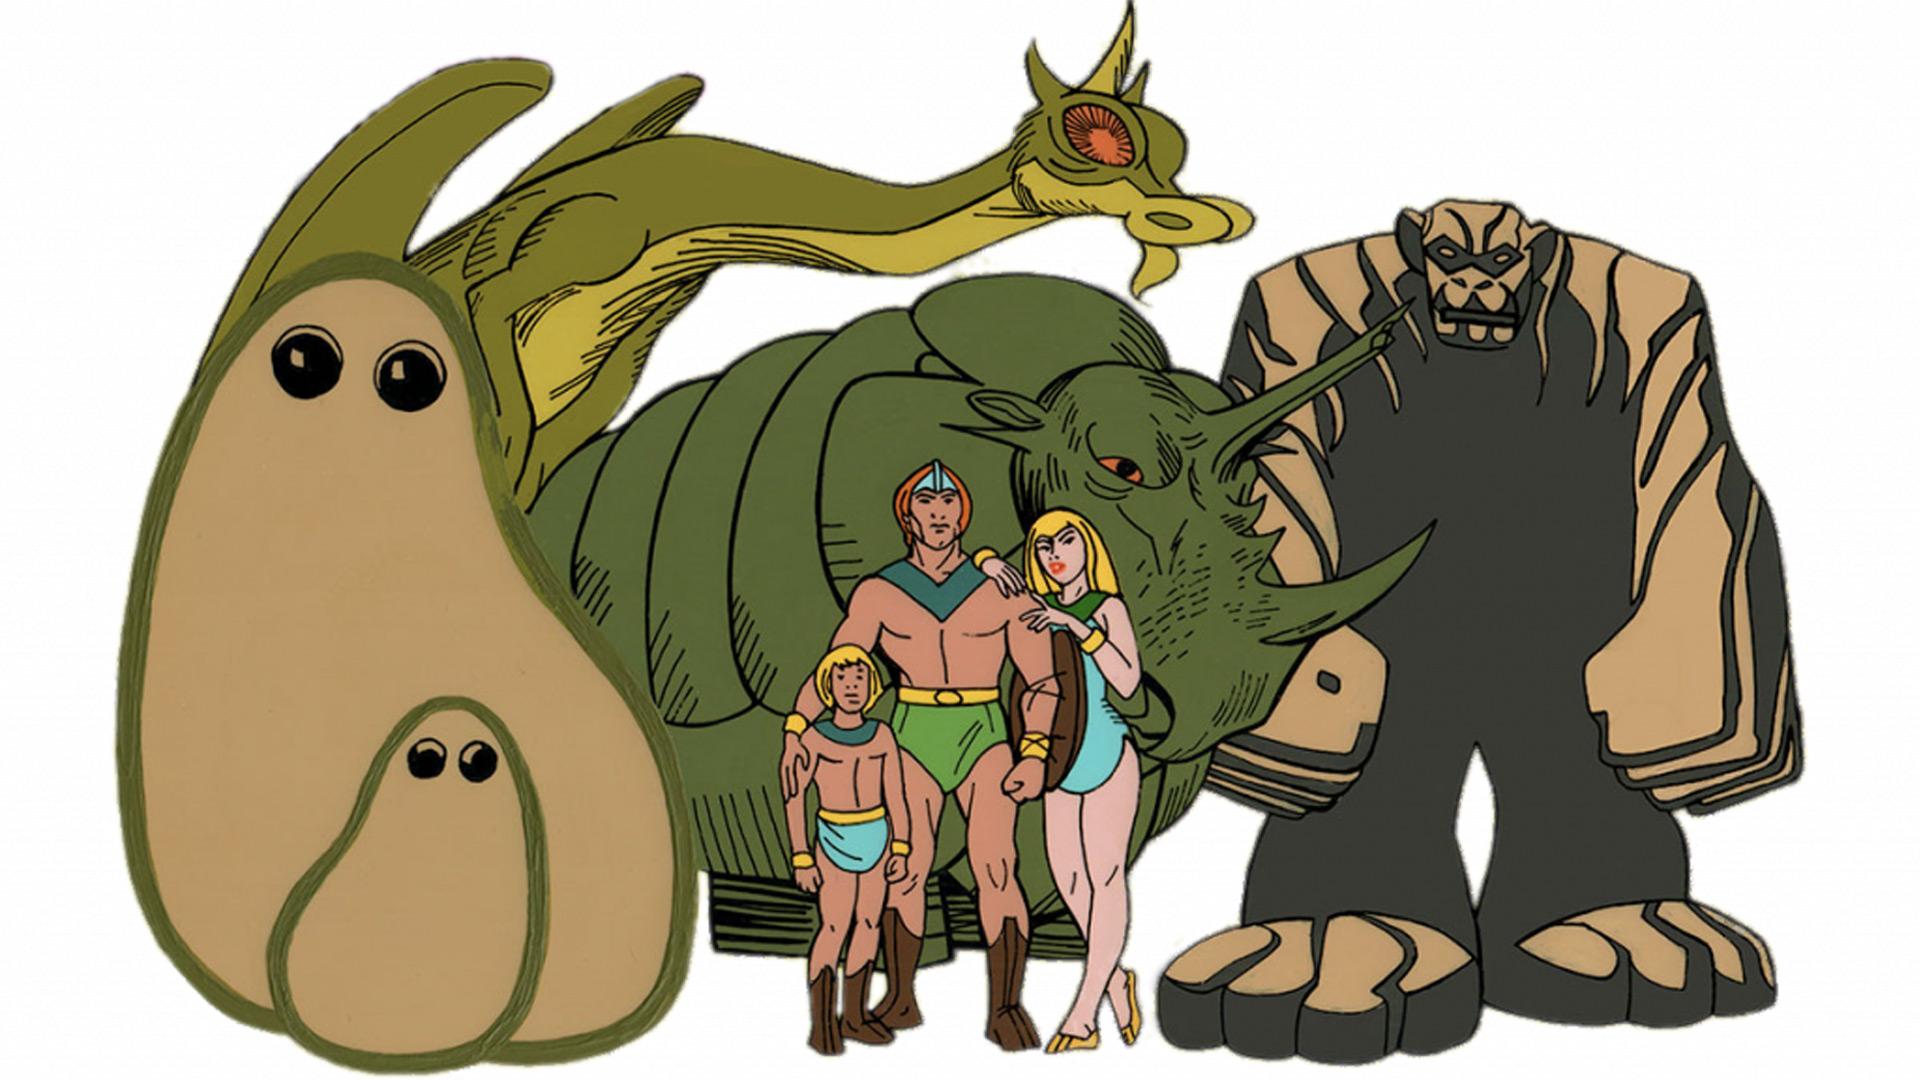 The Herculoids: The Complete Original Series